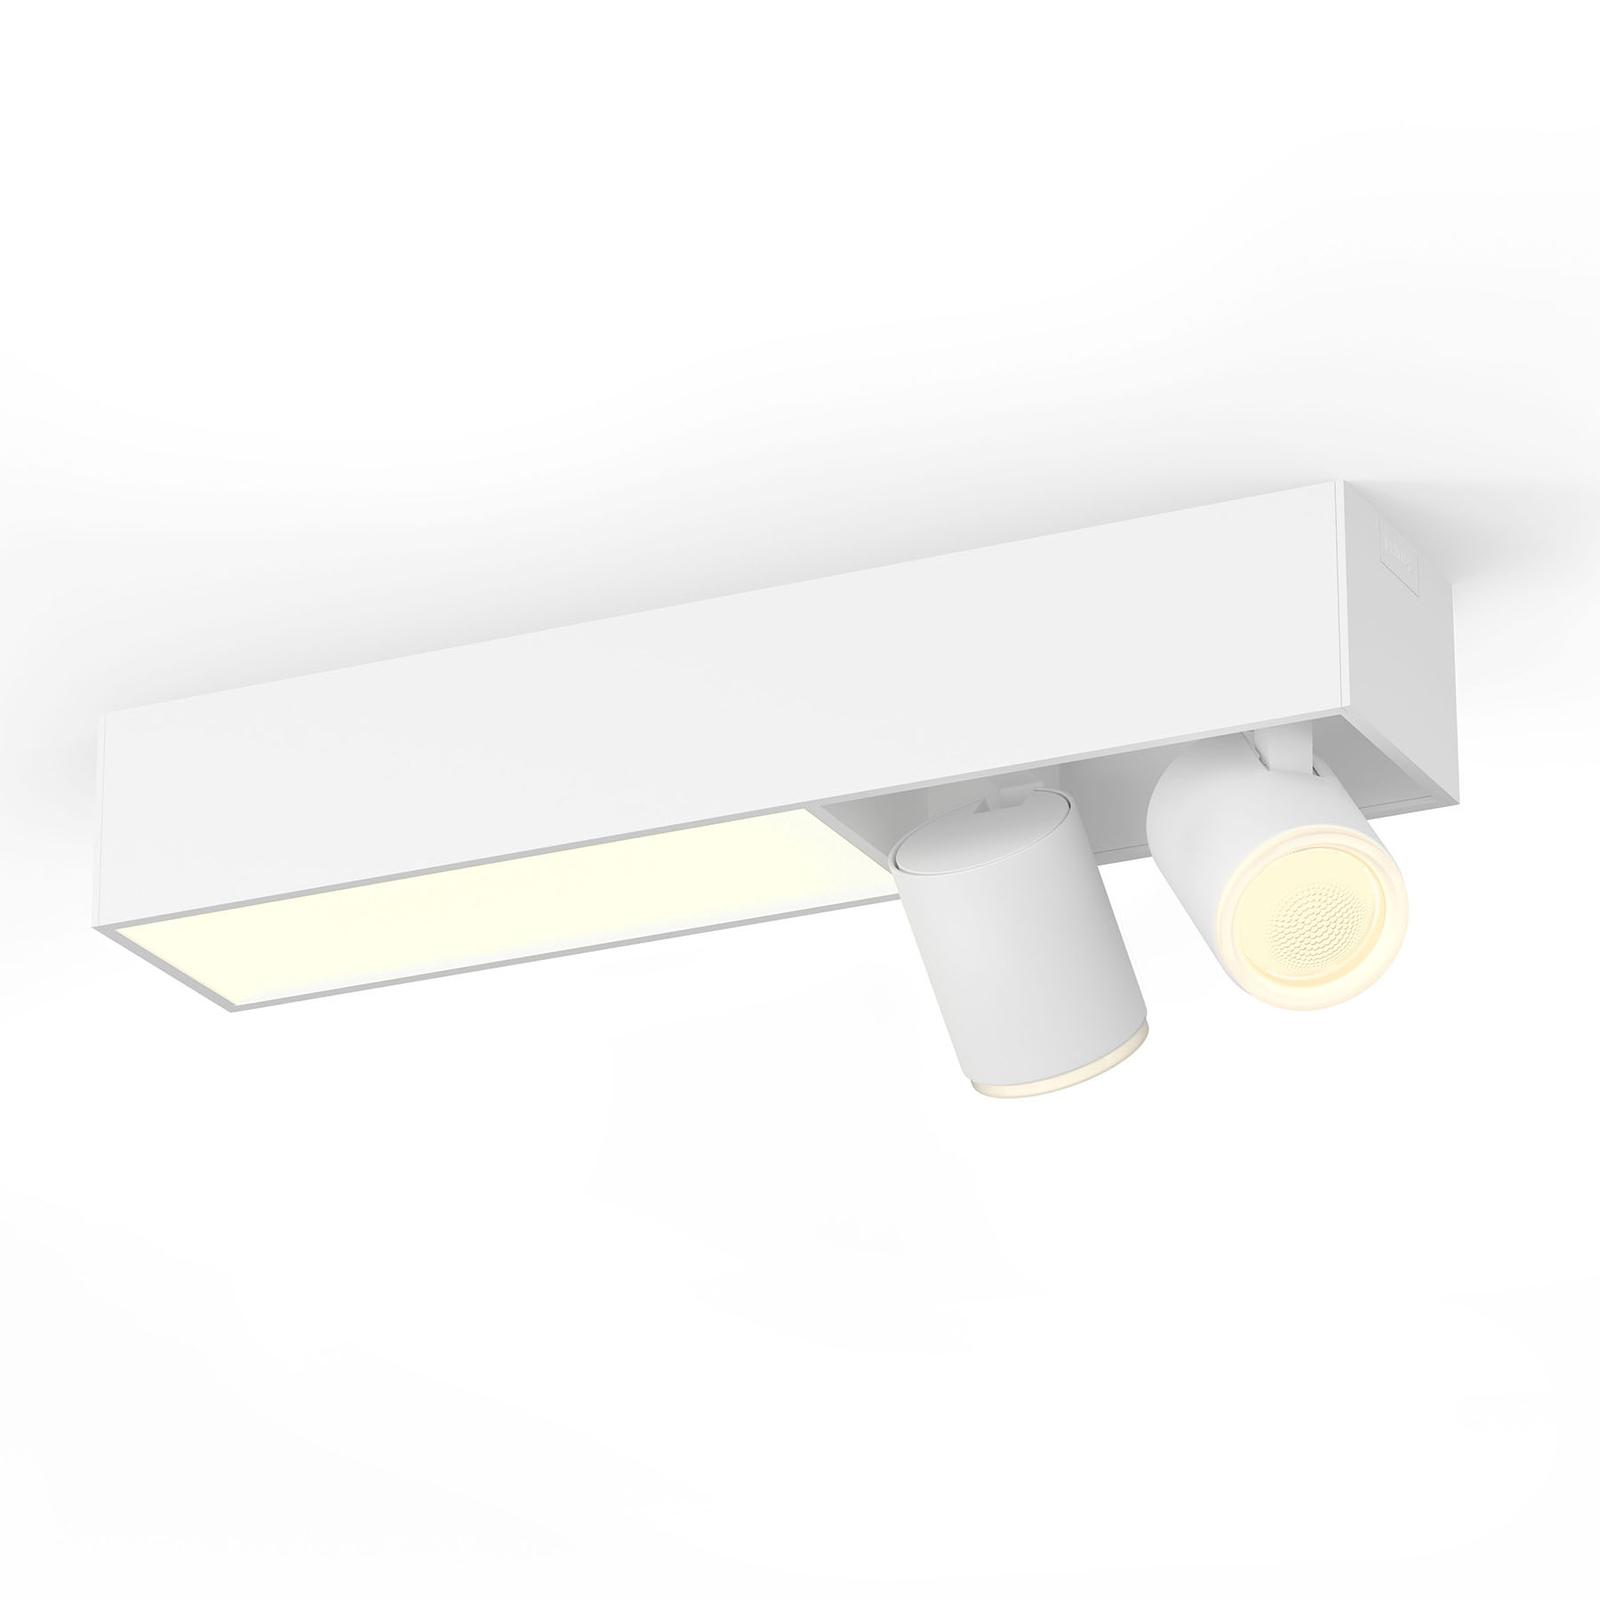 Philips Hue Centris LED-Spot zweiflammig, weiß